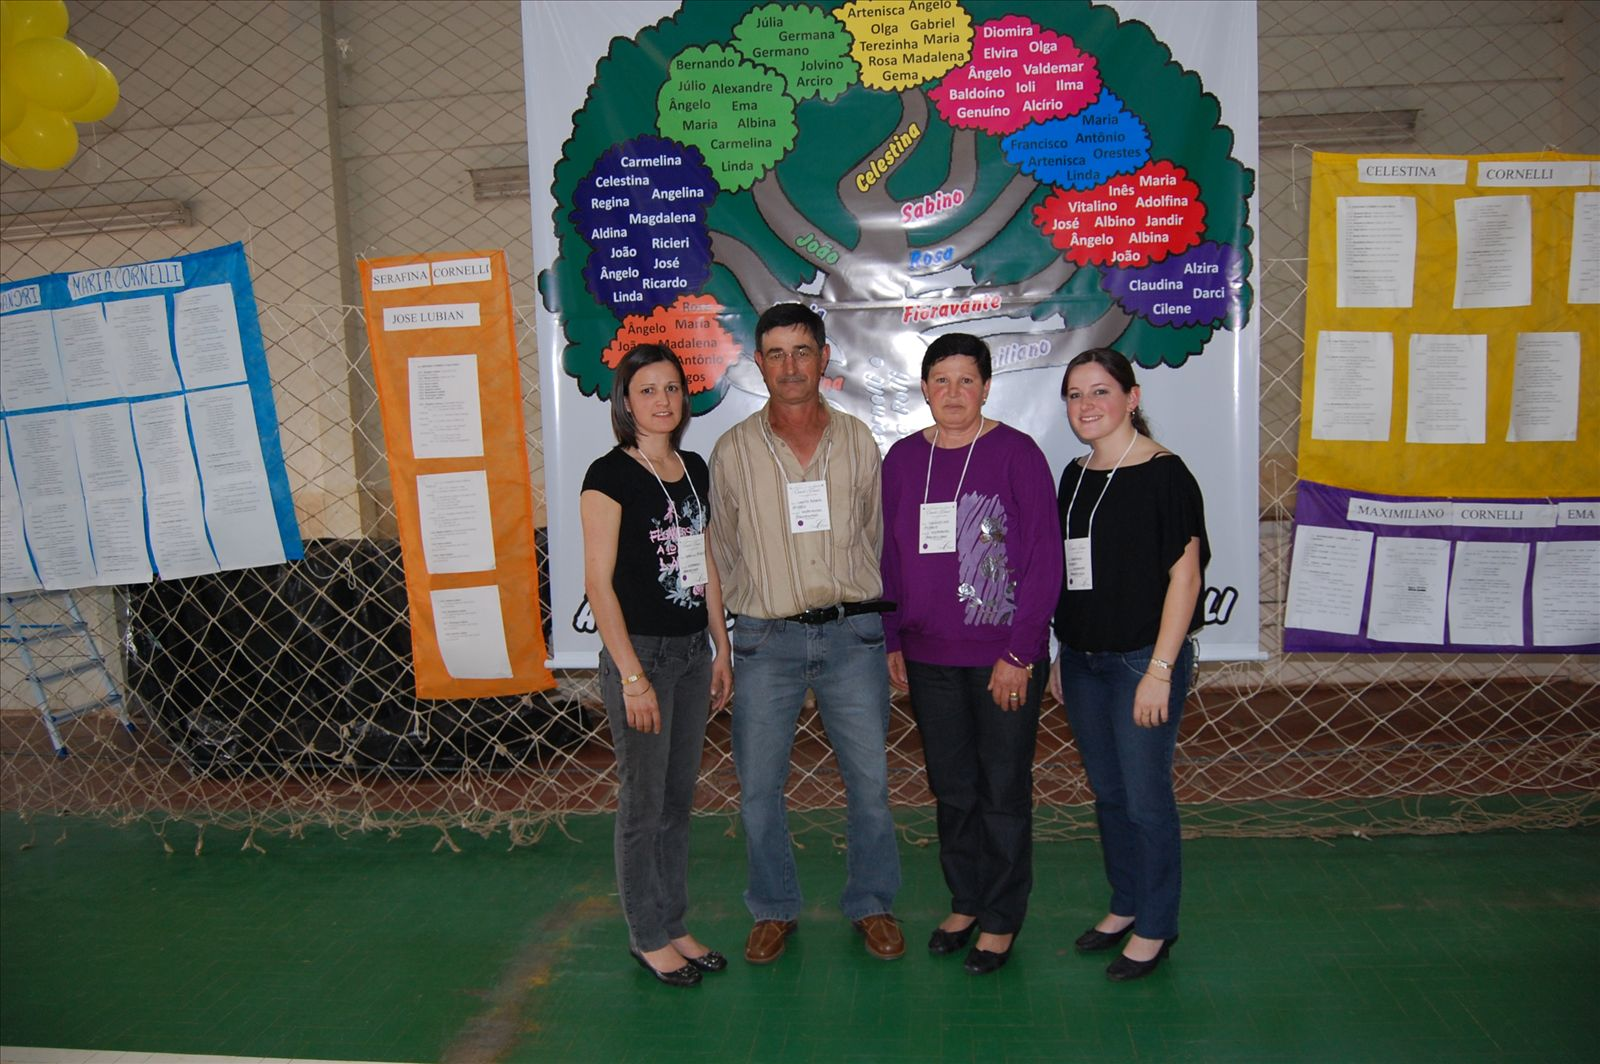 2º Encontro Família Cornelli - 11.10.2009 (222)_0